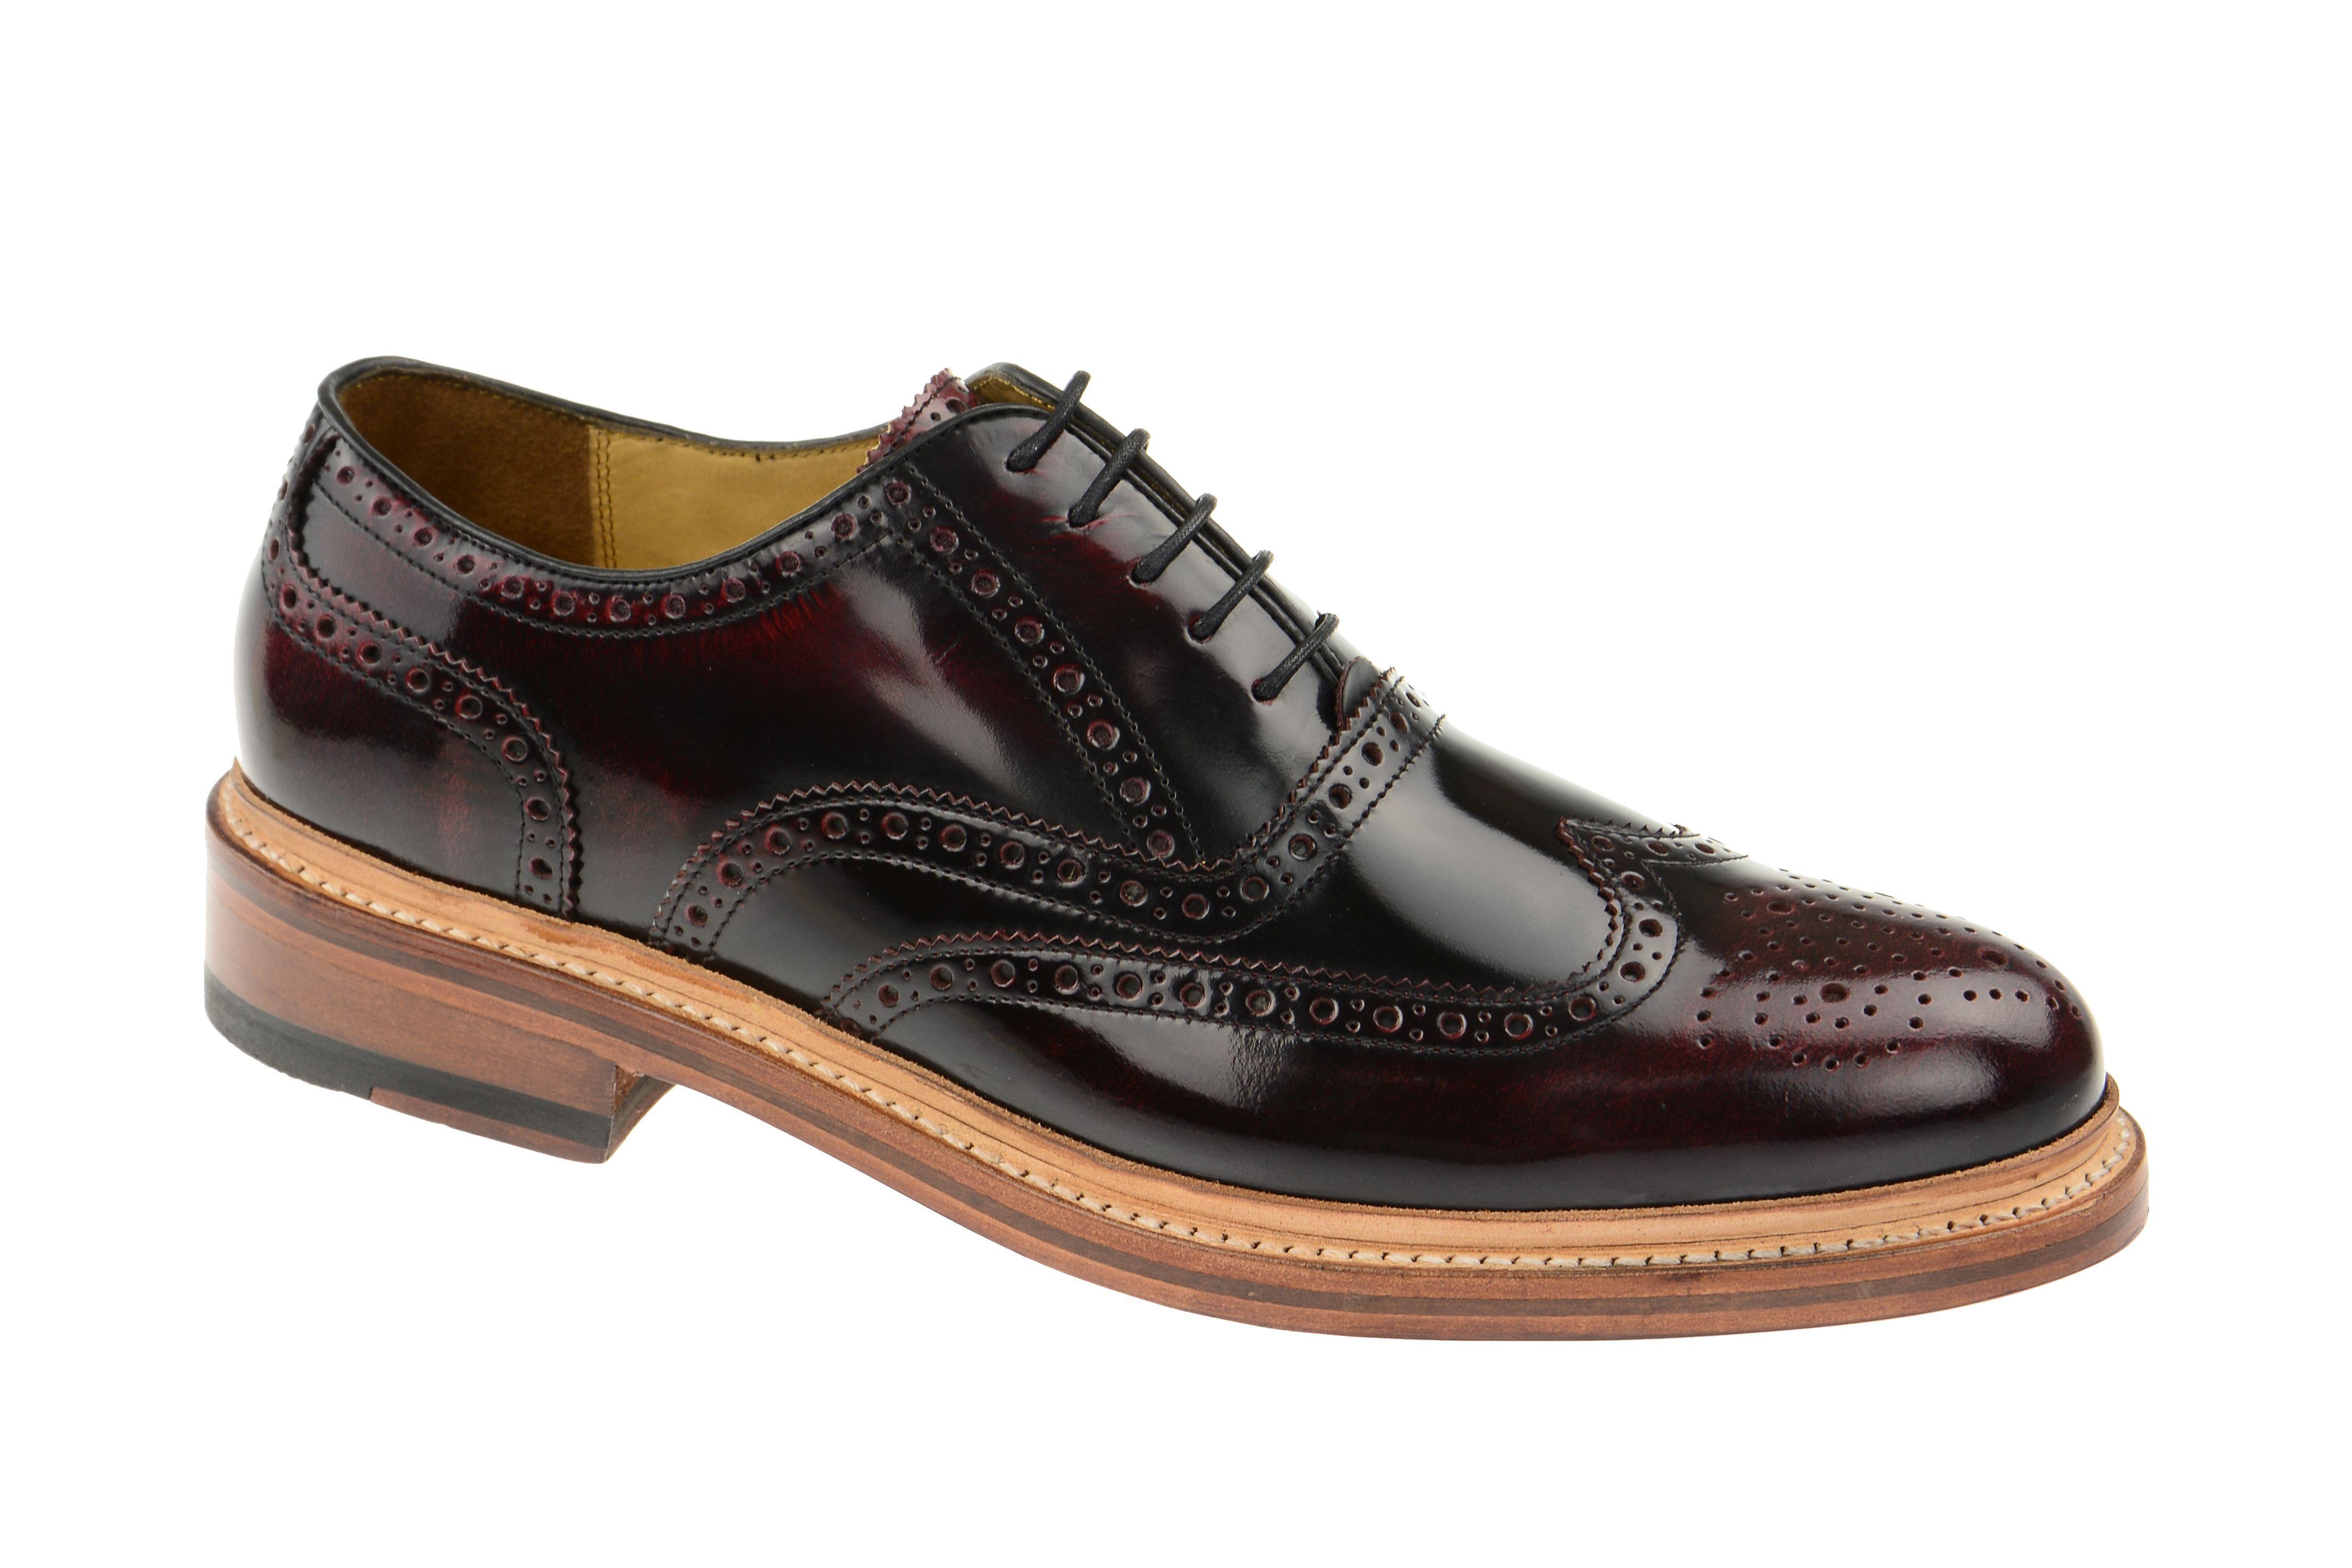 Gordon & Bros Levet Schuhe schwarz rot Rahmengenäht 2506